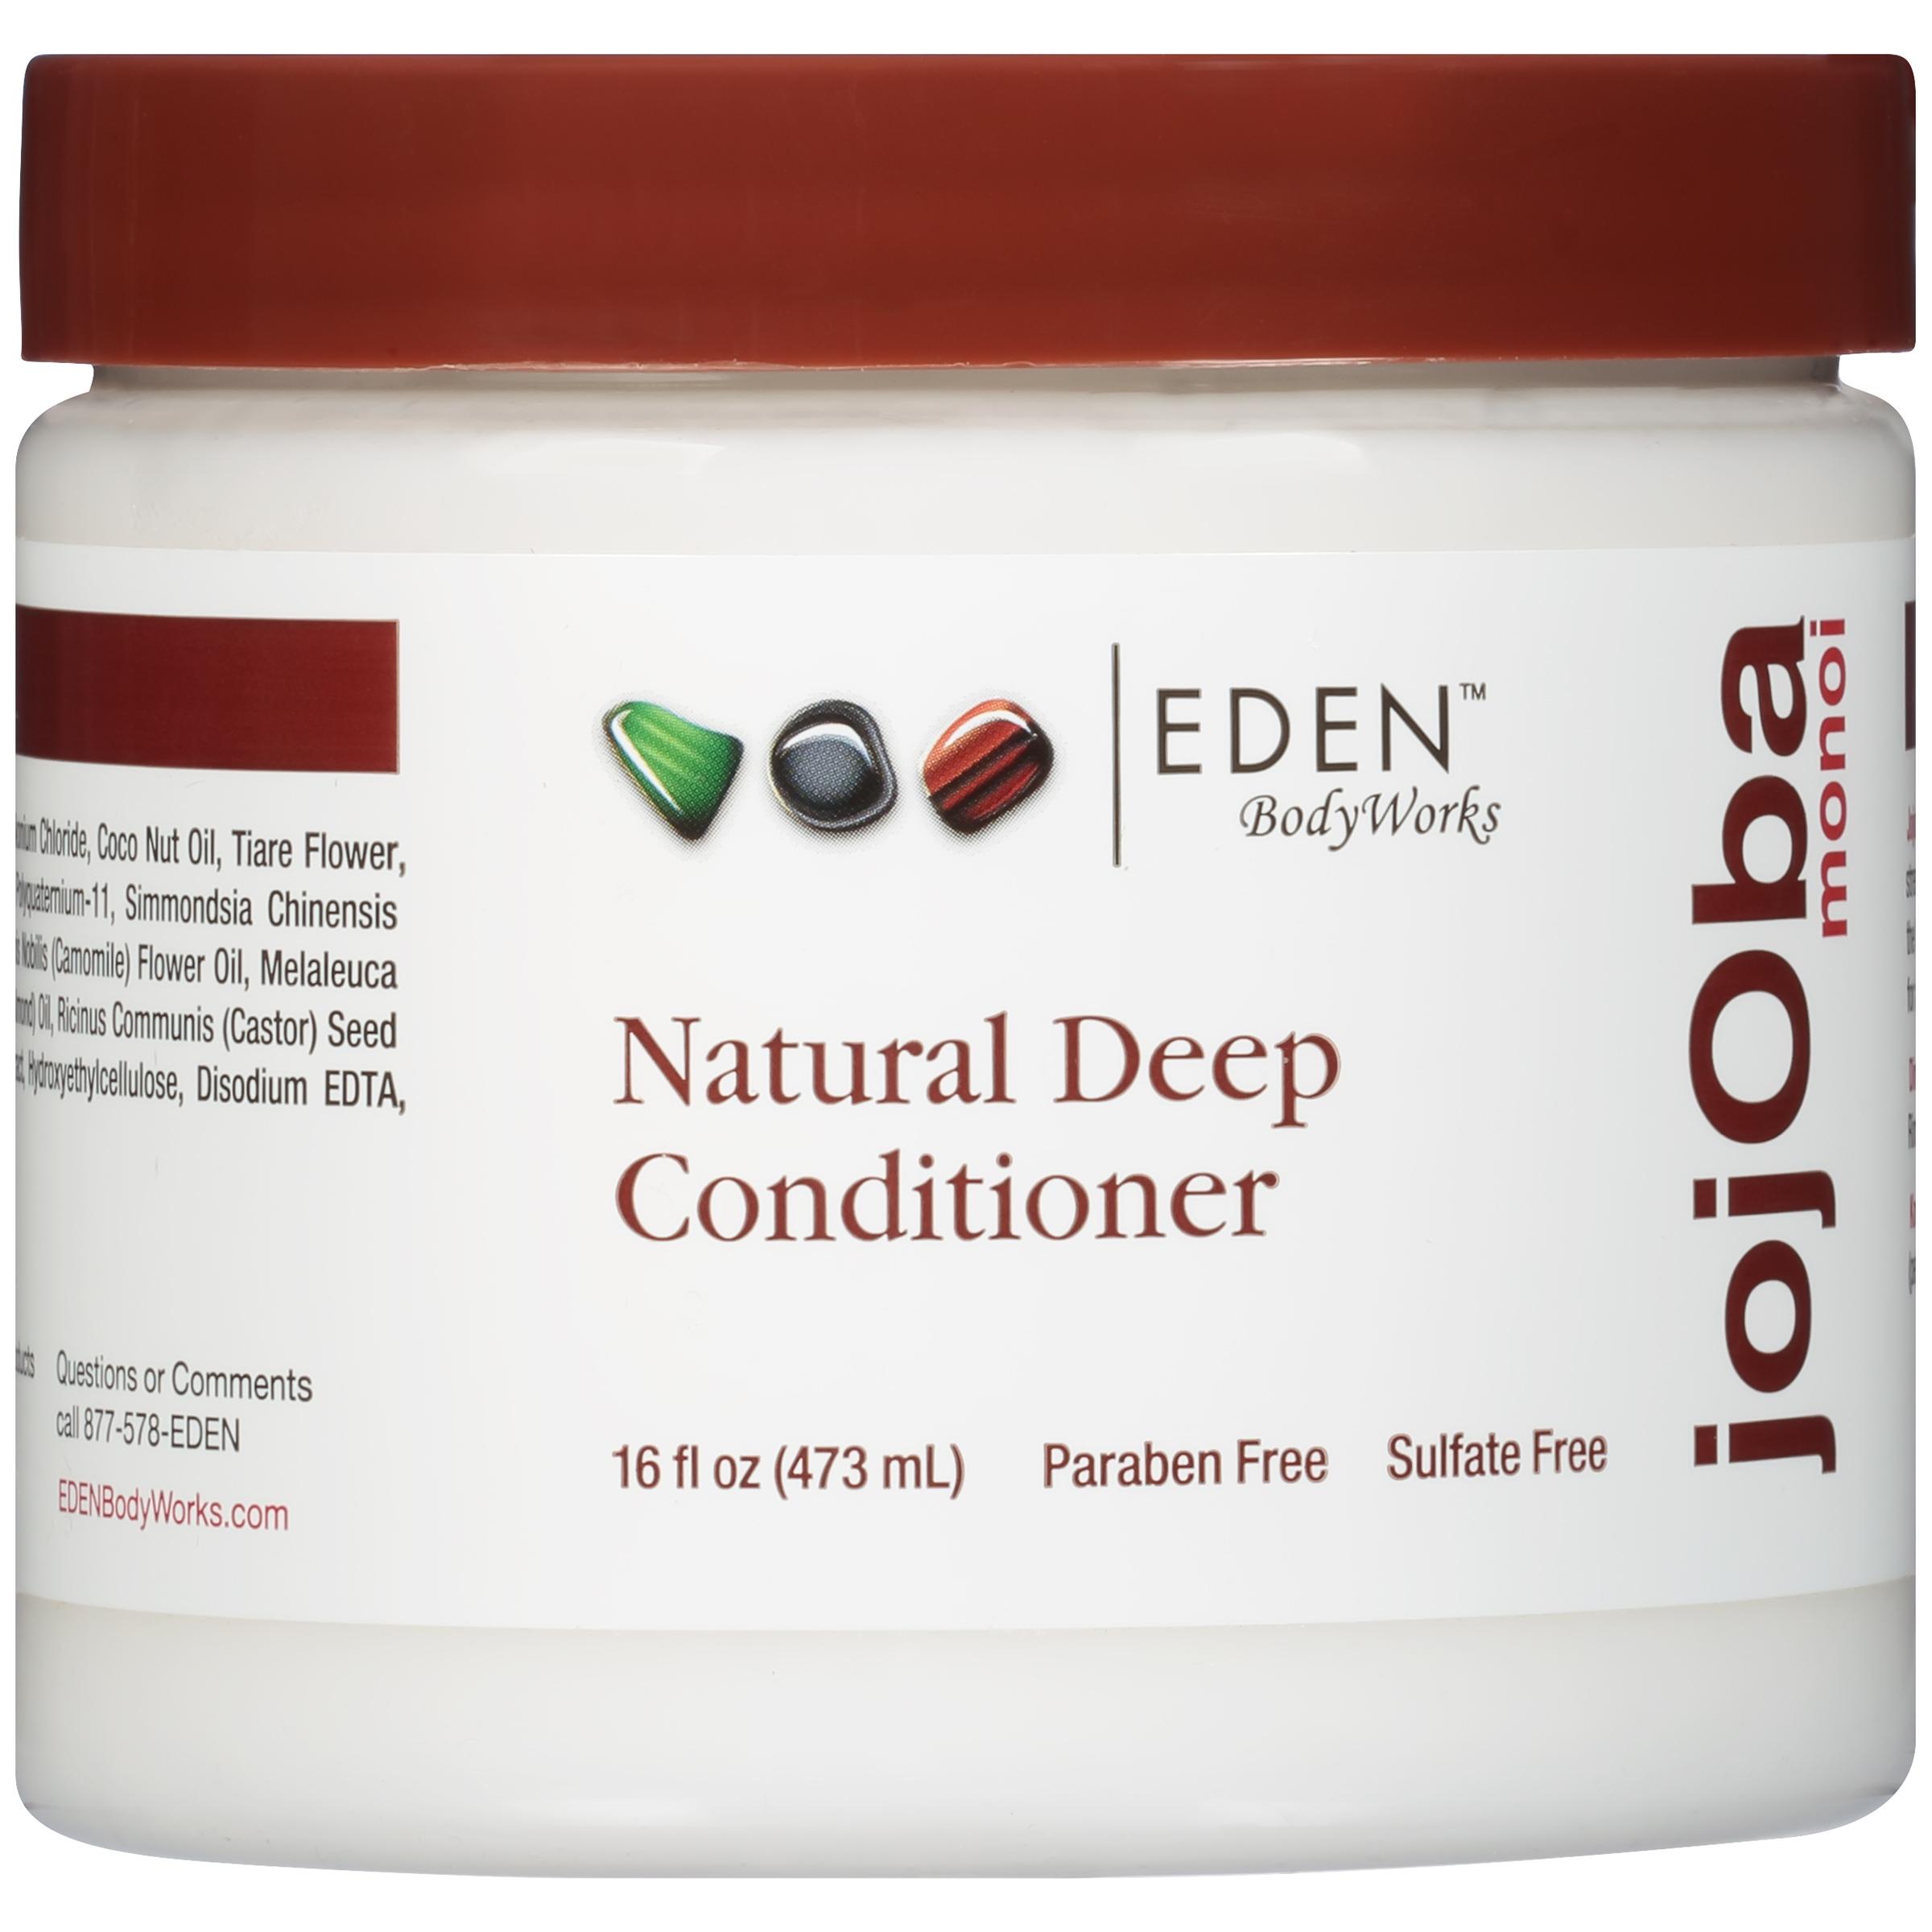 Wondrous Eden Bodyworks Jojoba Monoi All Natural Deep Conditioner 16 Fl Oz Hairstyle Inspiration Daily Dogsangcom